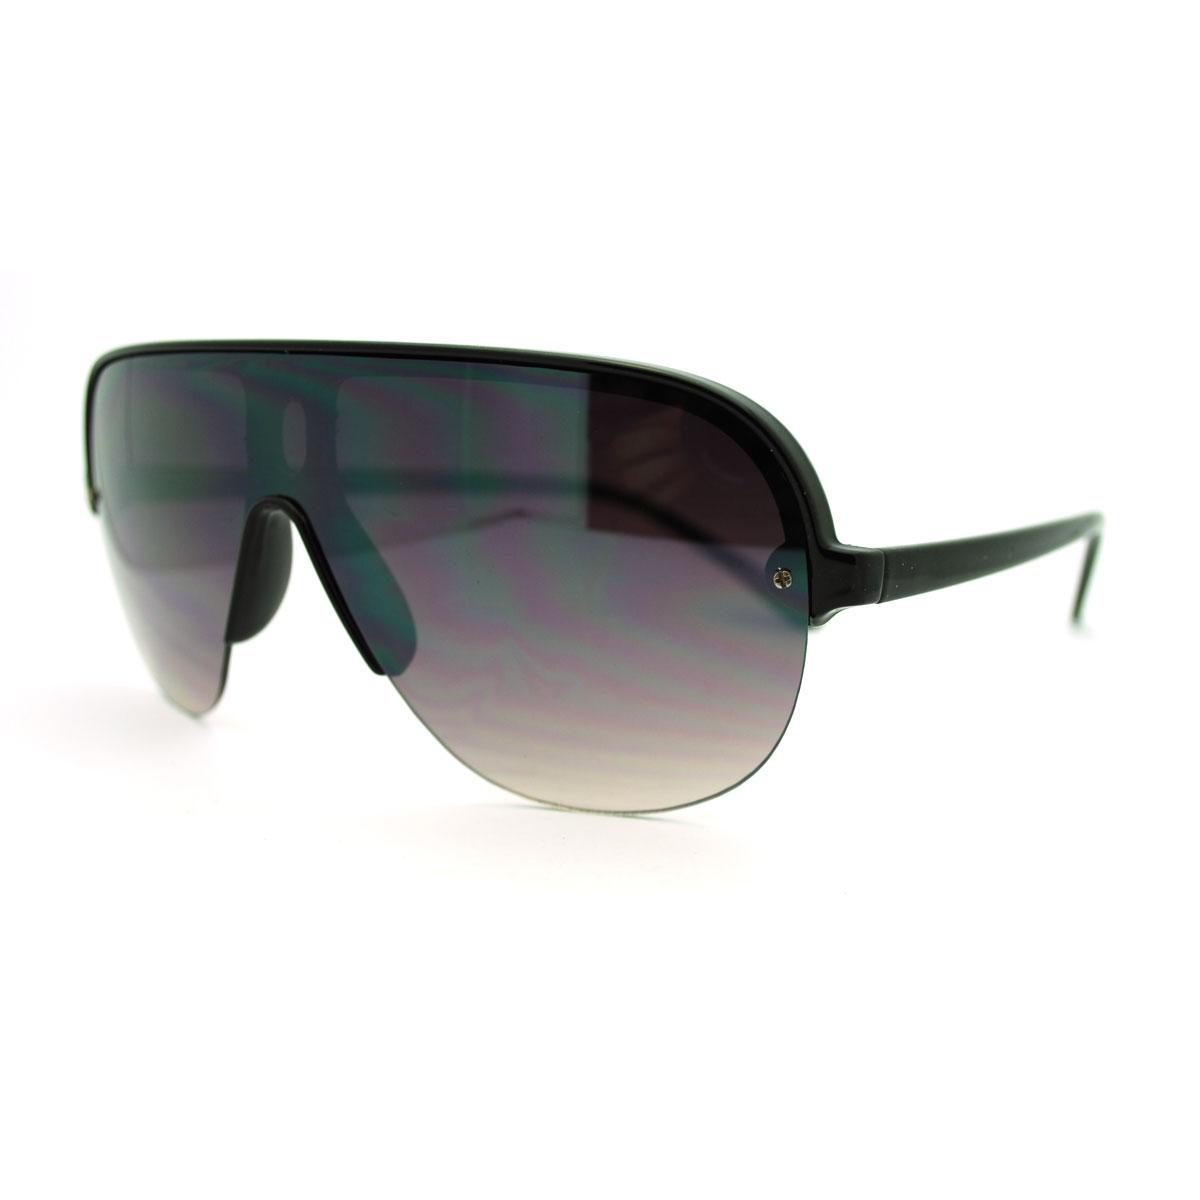 Half Rim Sunglasses  retro rimless half rim oversized shield style aviator sunglasses